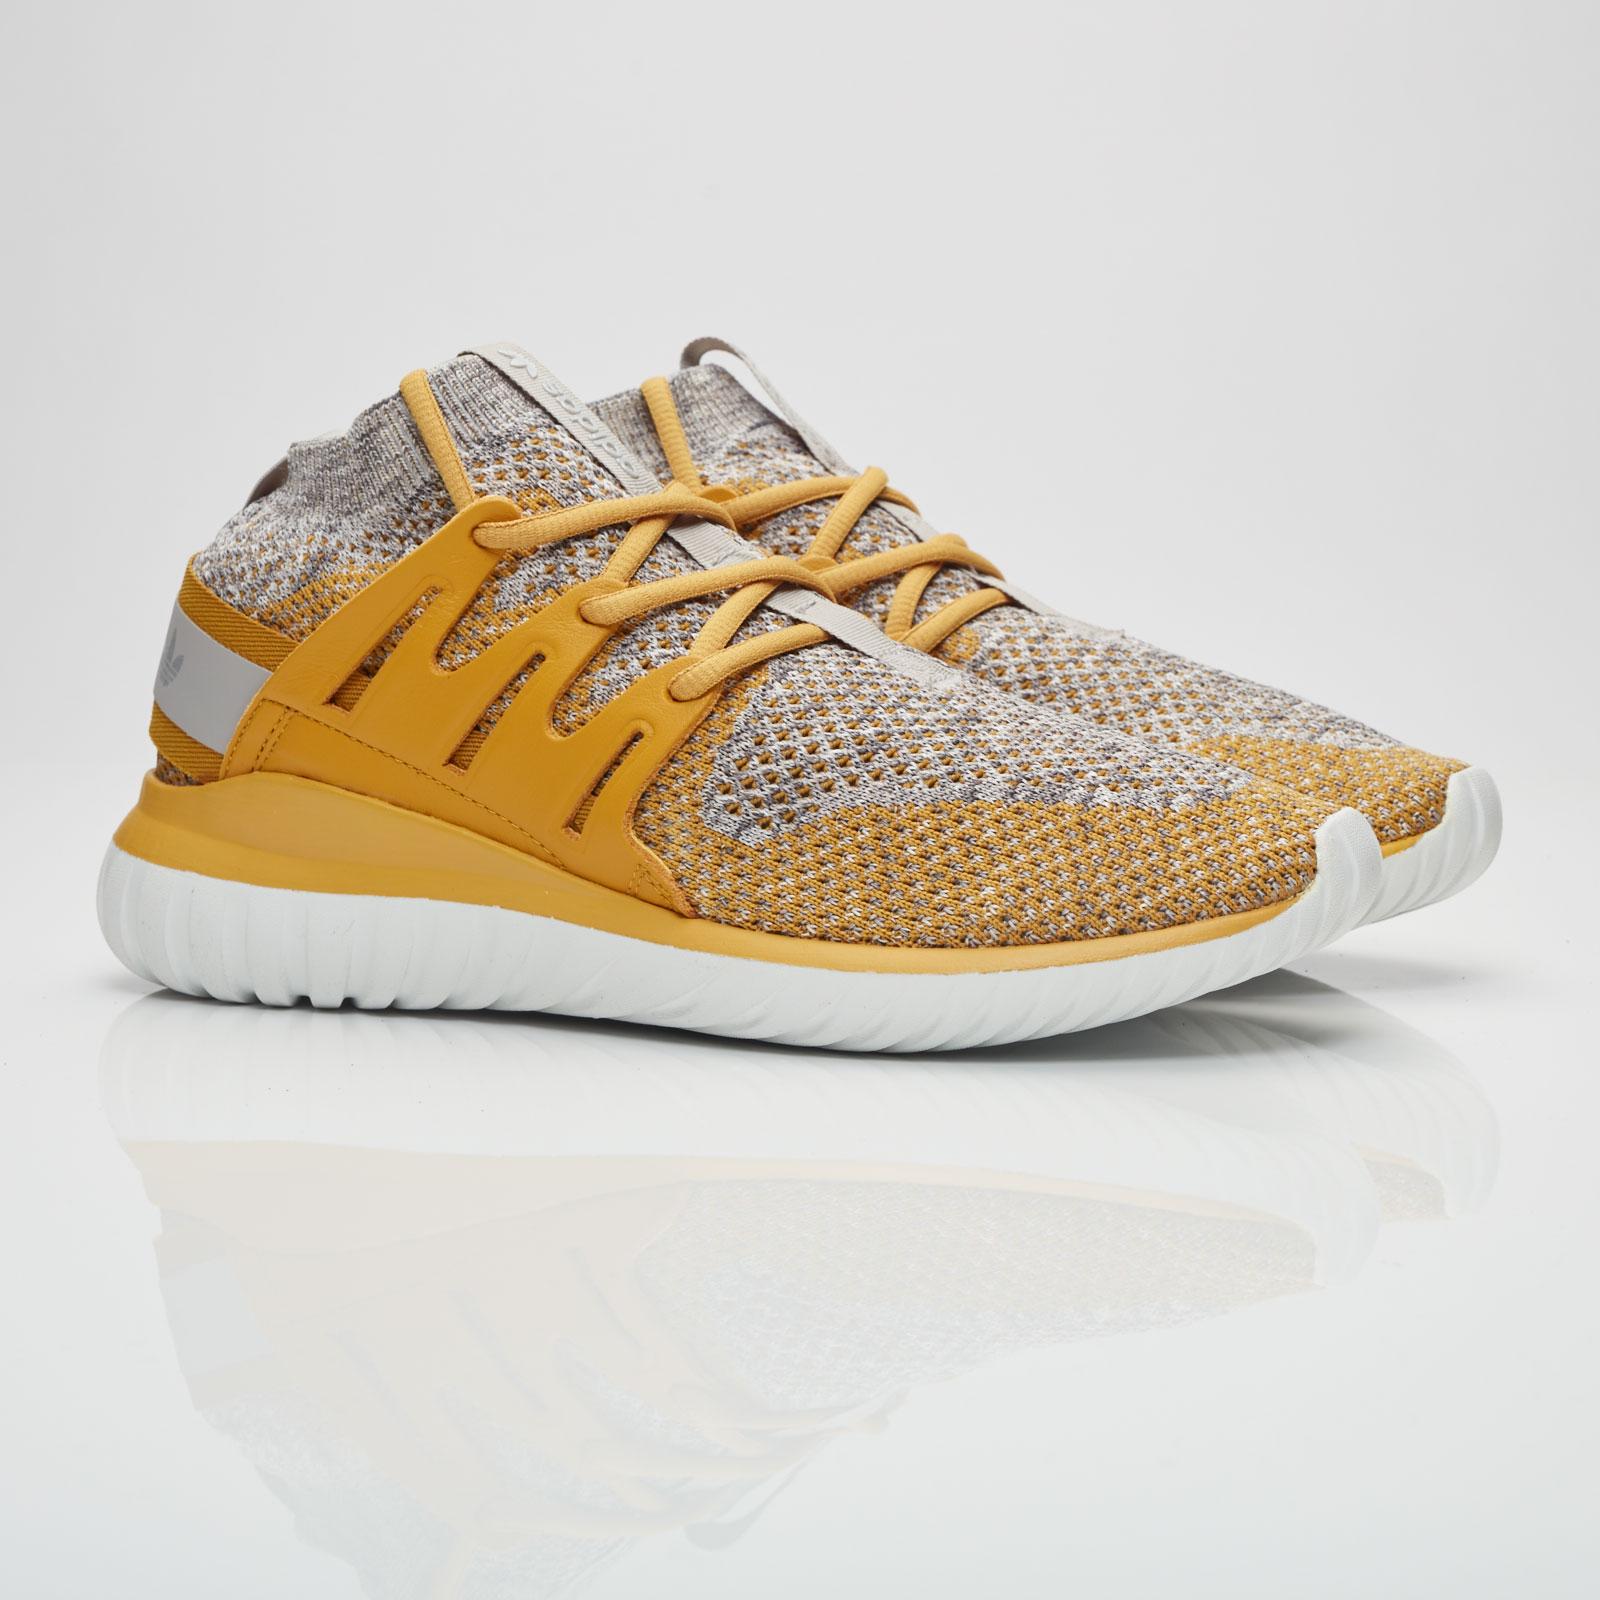 61cc4723cf54 adidas Tubular Nova Primeknit - Bb8407 - Sneakersnstuff